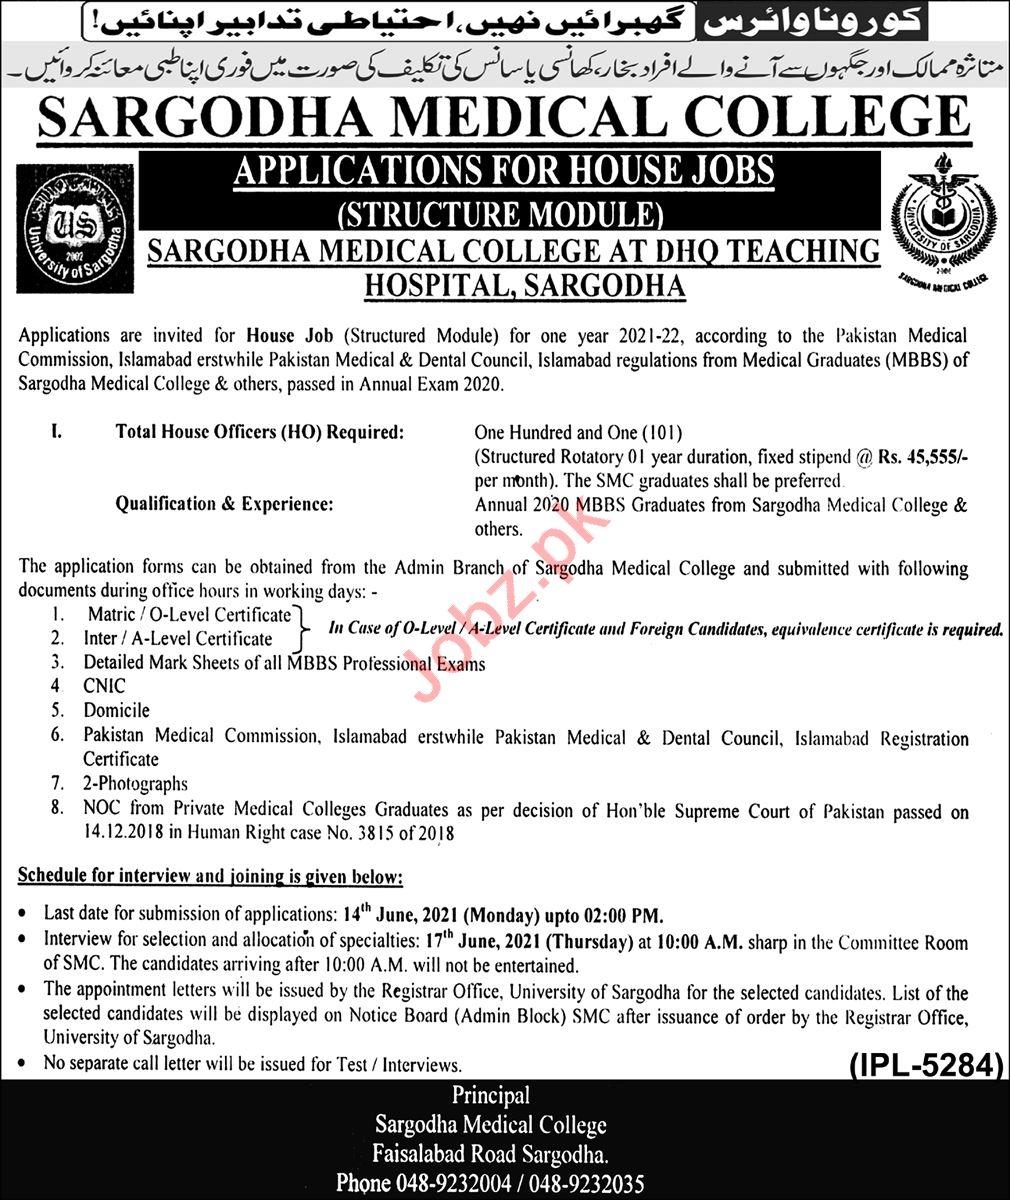 Sargoda Medical College DHQ Teaching Hospital Jobs 2021